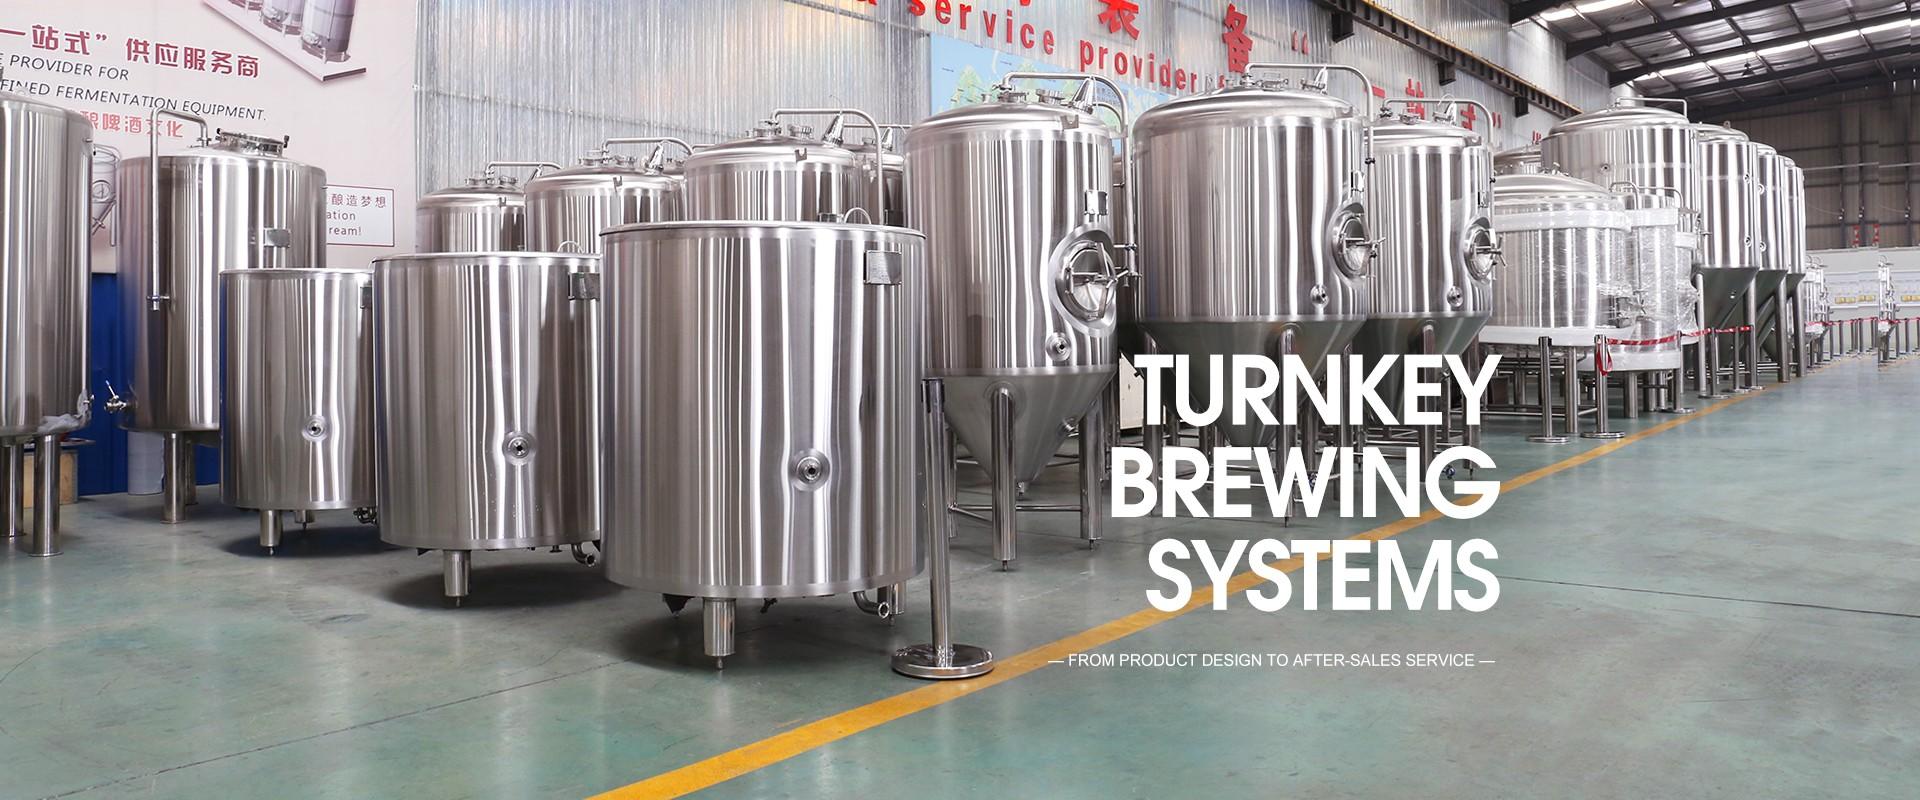 Attrezzatura per birra di fabbrica